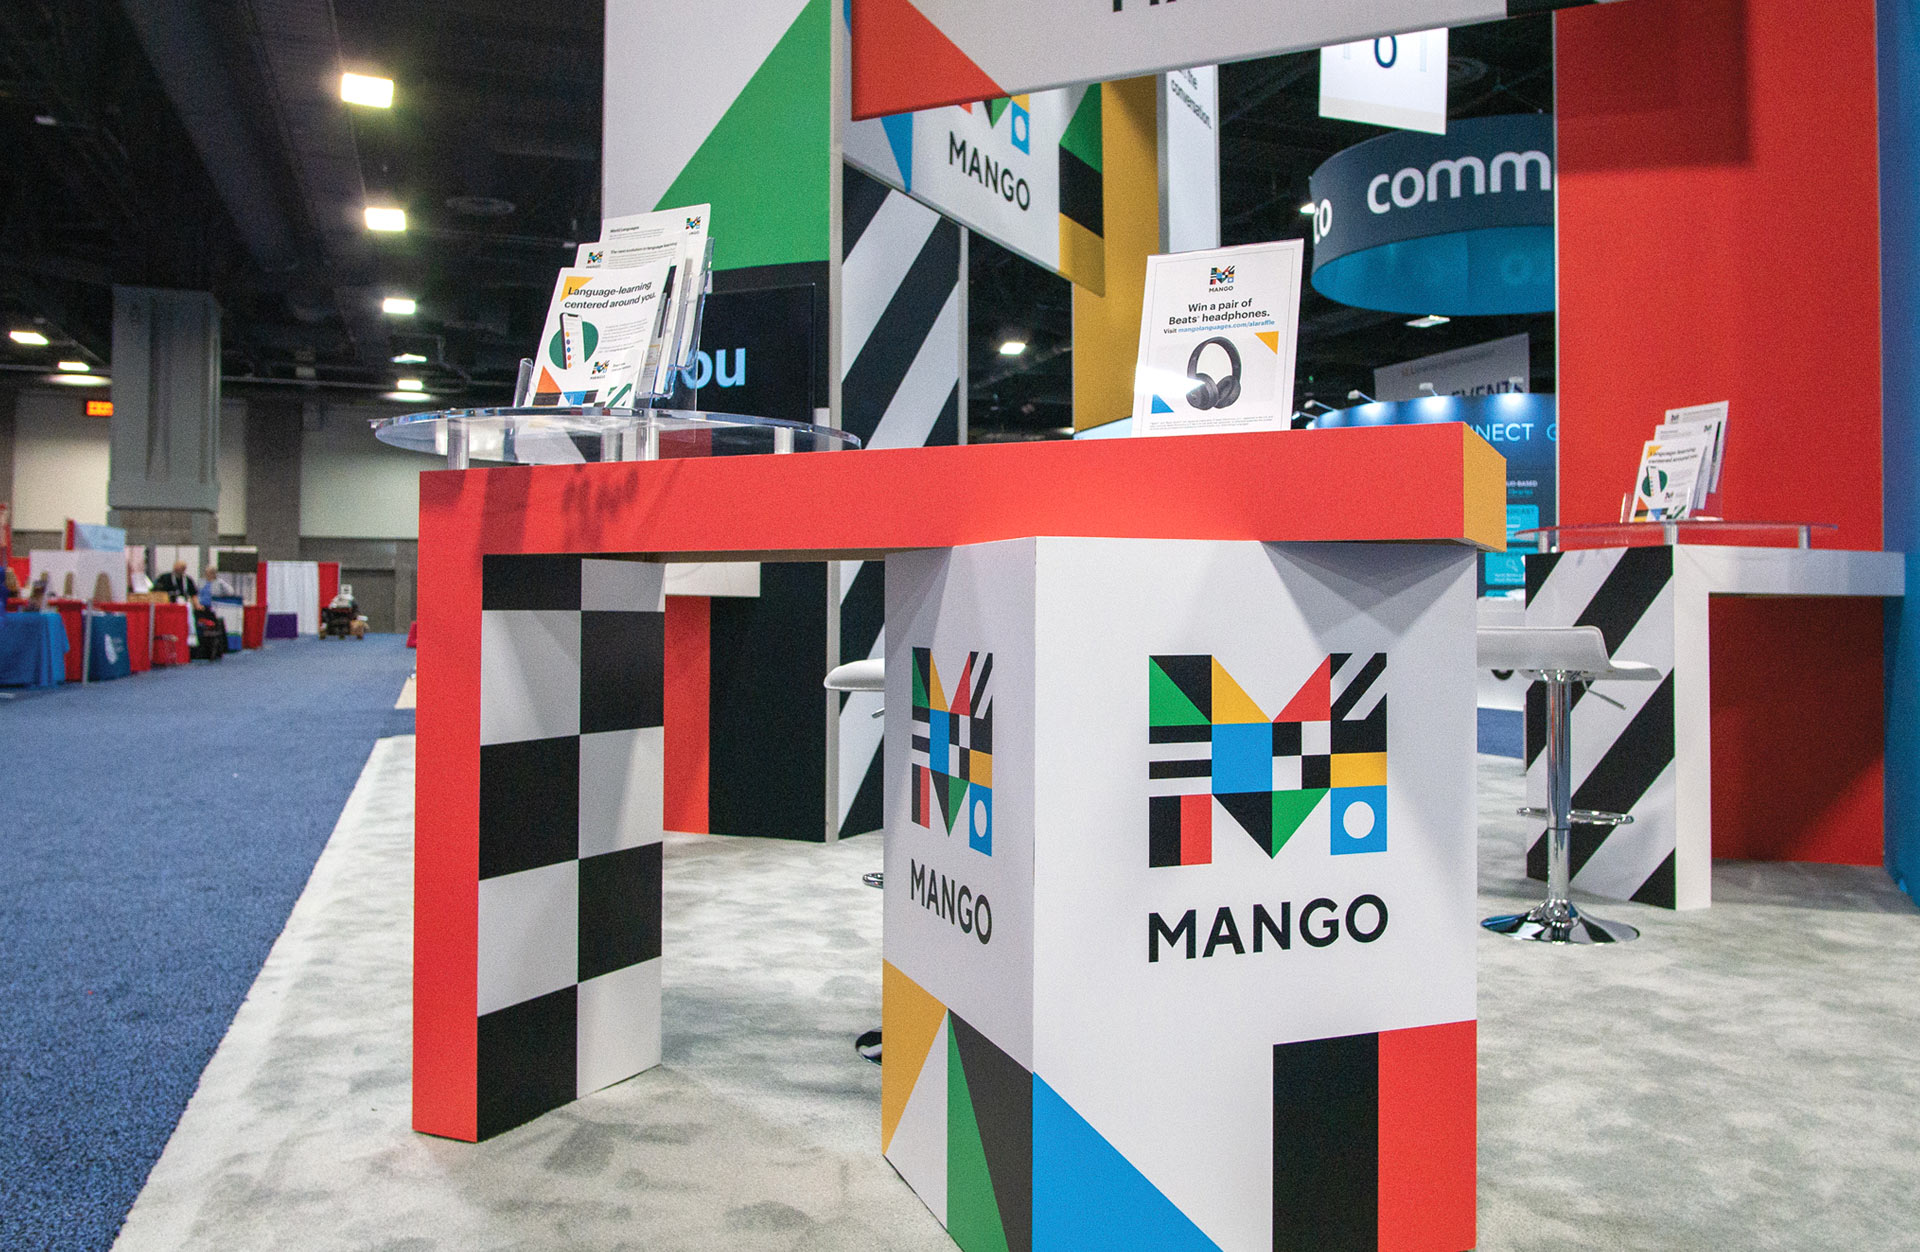 mango-booth-5.jpg